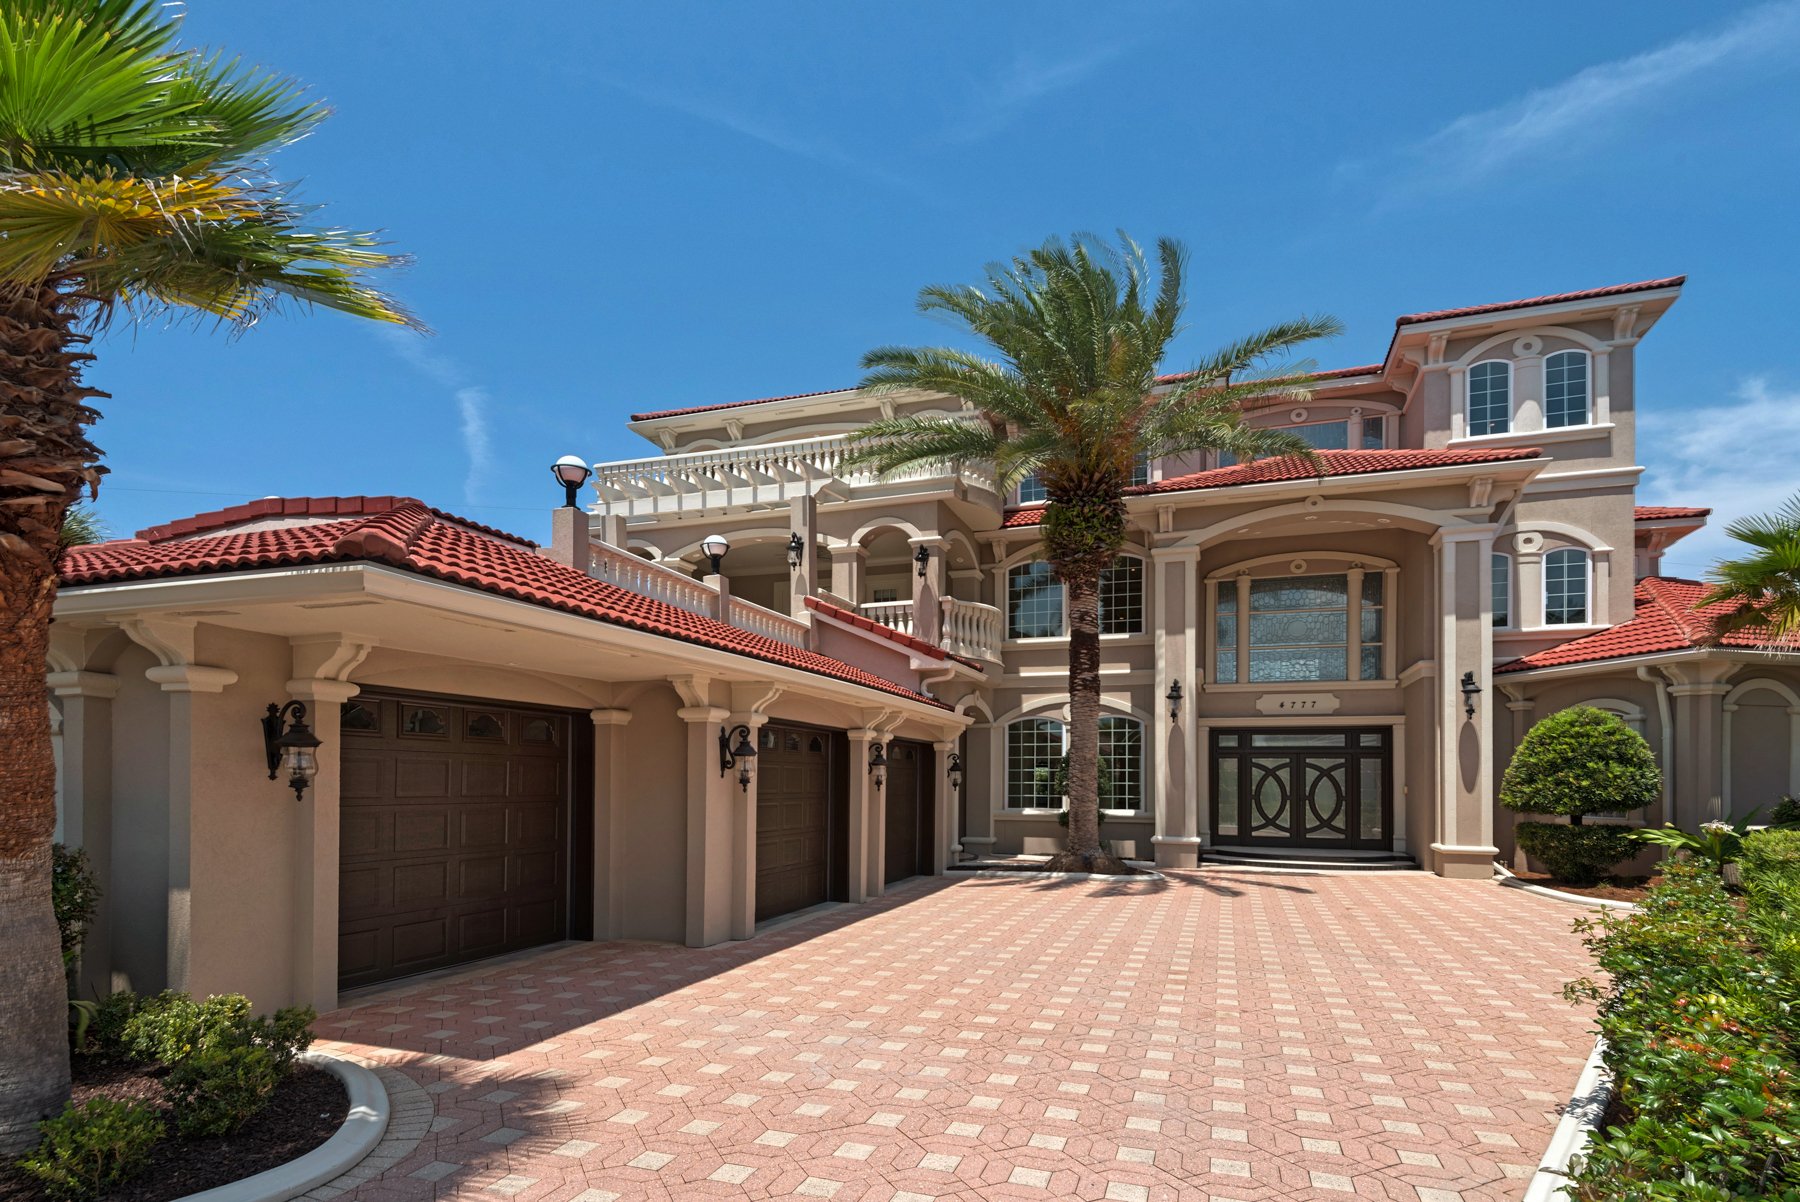 Bella Casa Destin Getaways Vacation Rentals